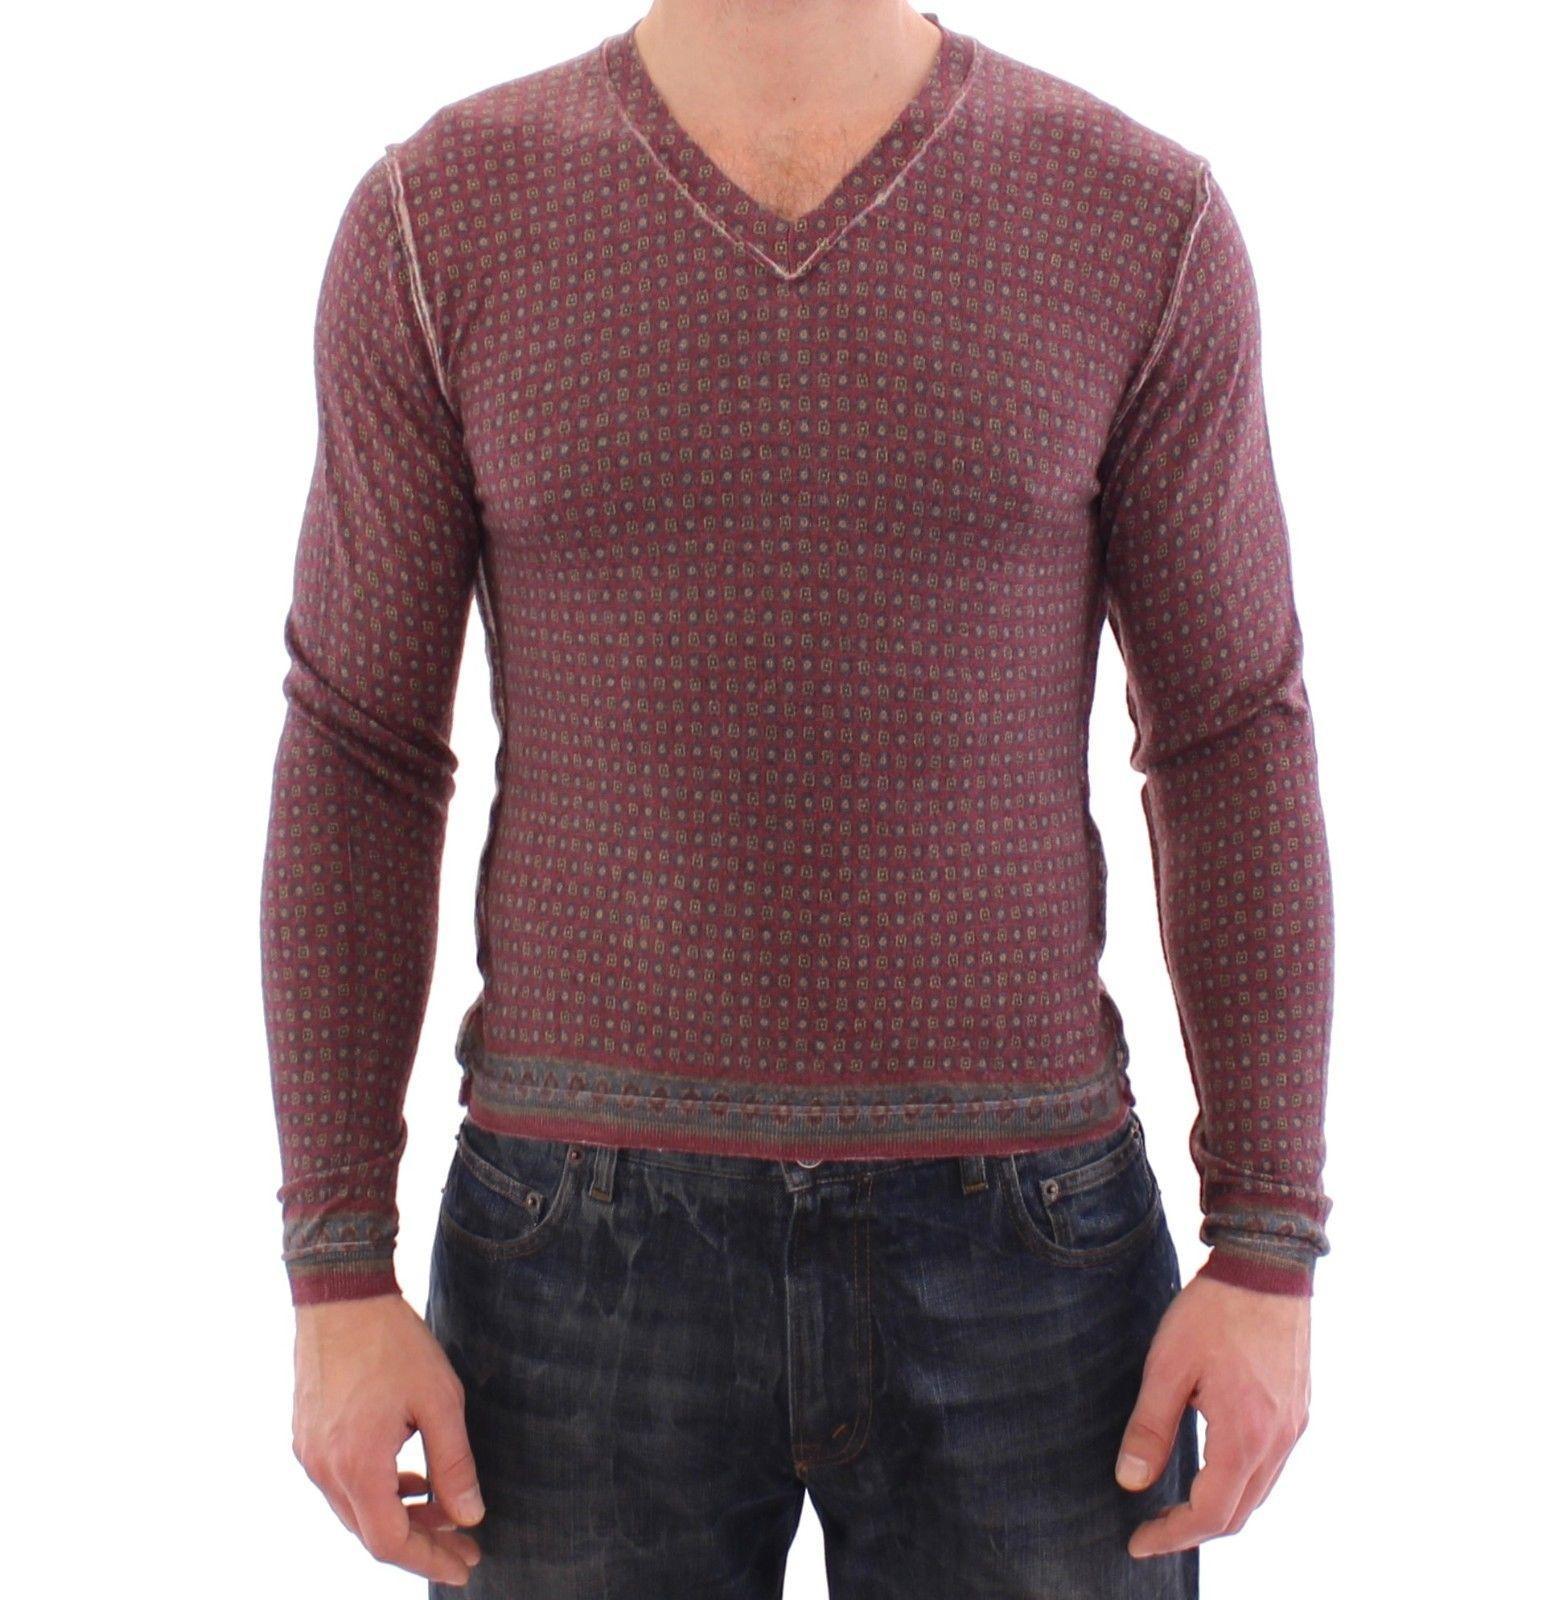 Dolce & Gabbana Men's Cashmere Sweater Pullover Multicolor GSS15153 - IT44   XS